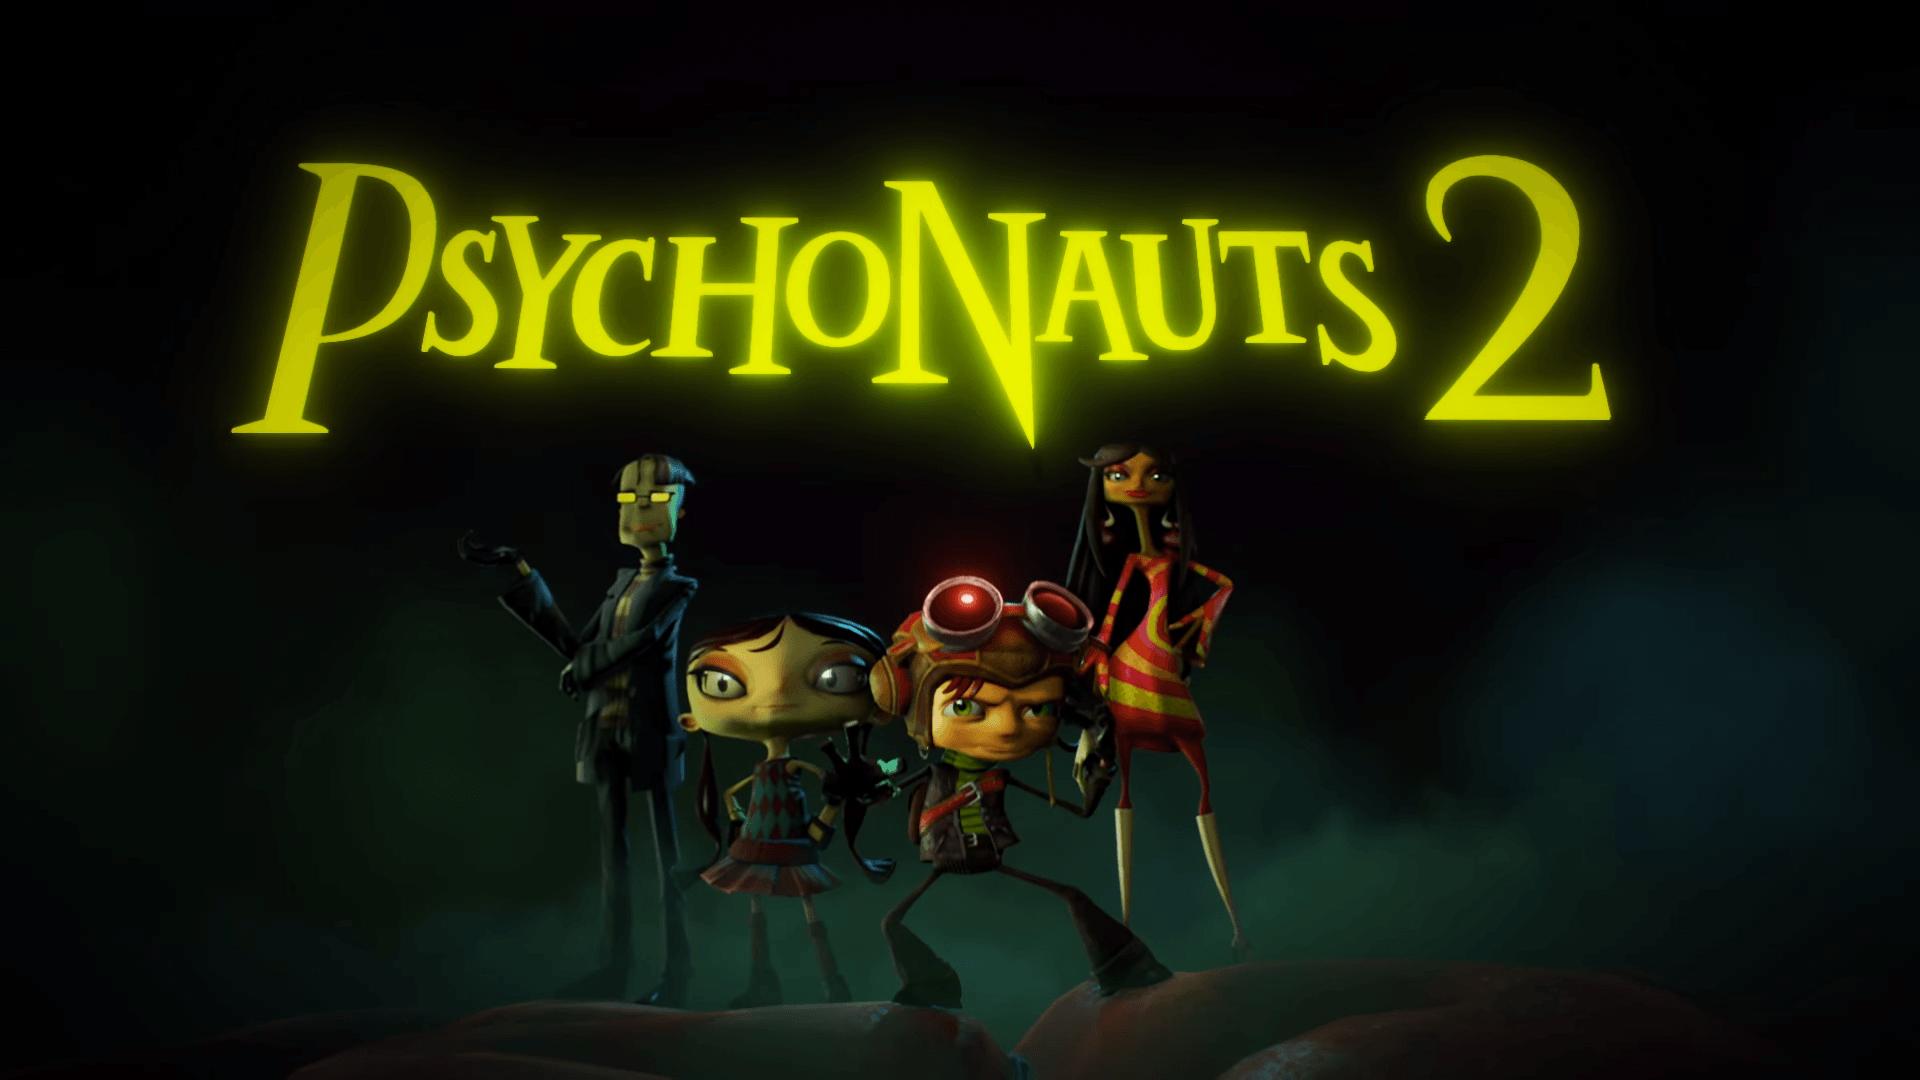 psychonauts 2 game wallpaper 72637